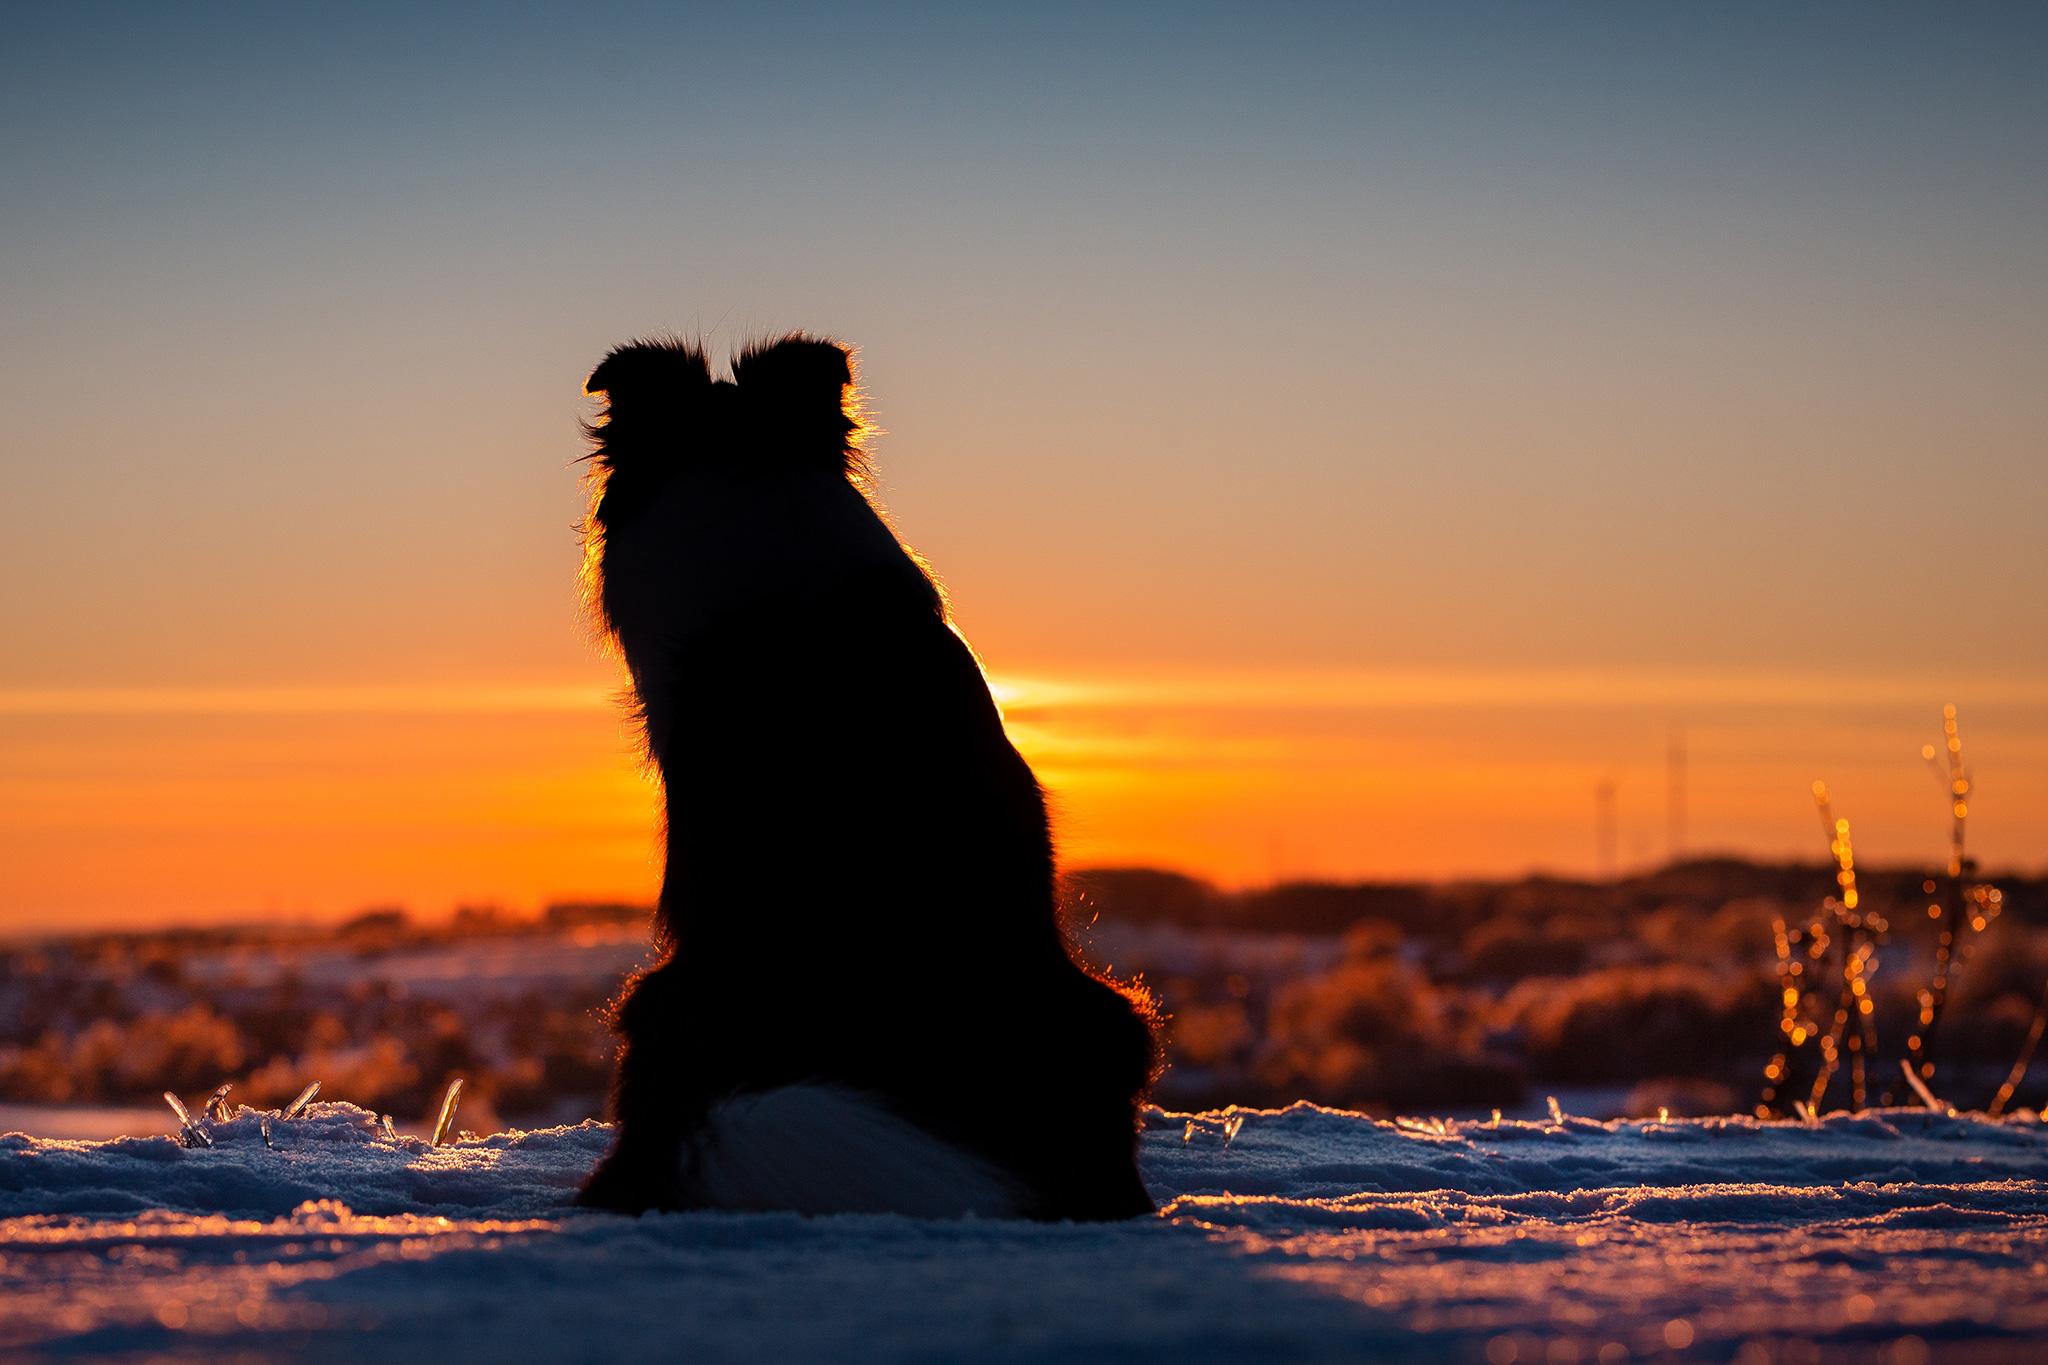 Border Collie Hündin, Schattenriss, im Sonnenuntergang